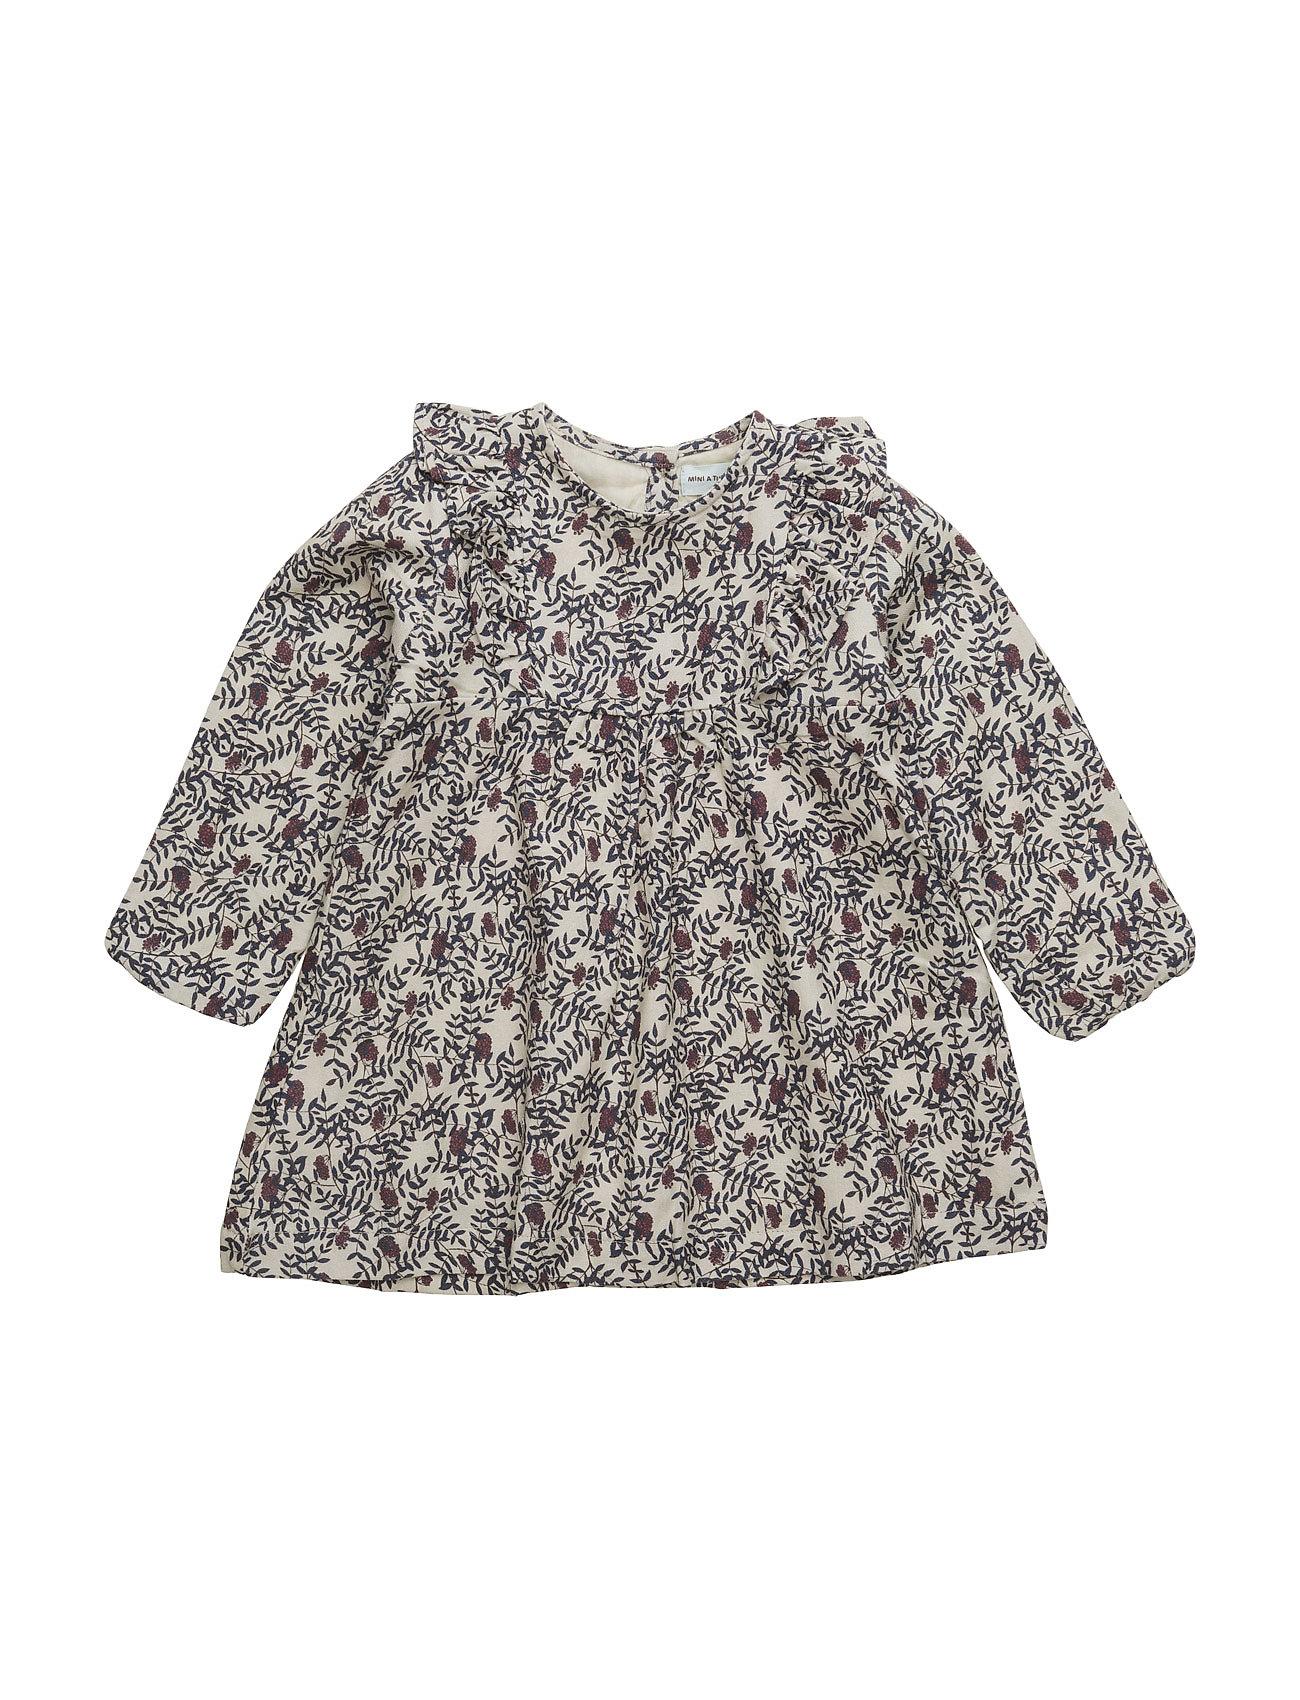 Mini A Ture Aicha, BM Dress LS